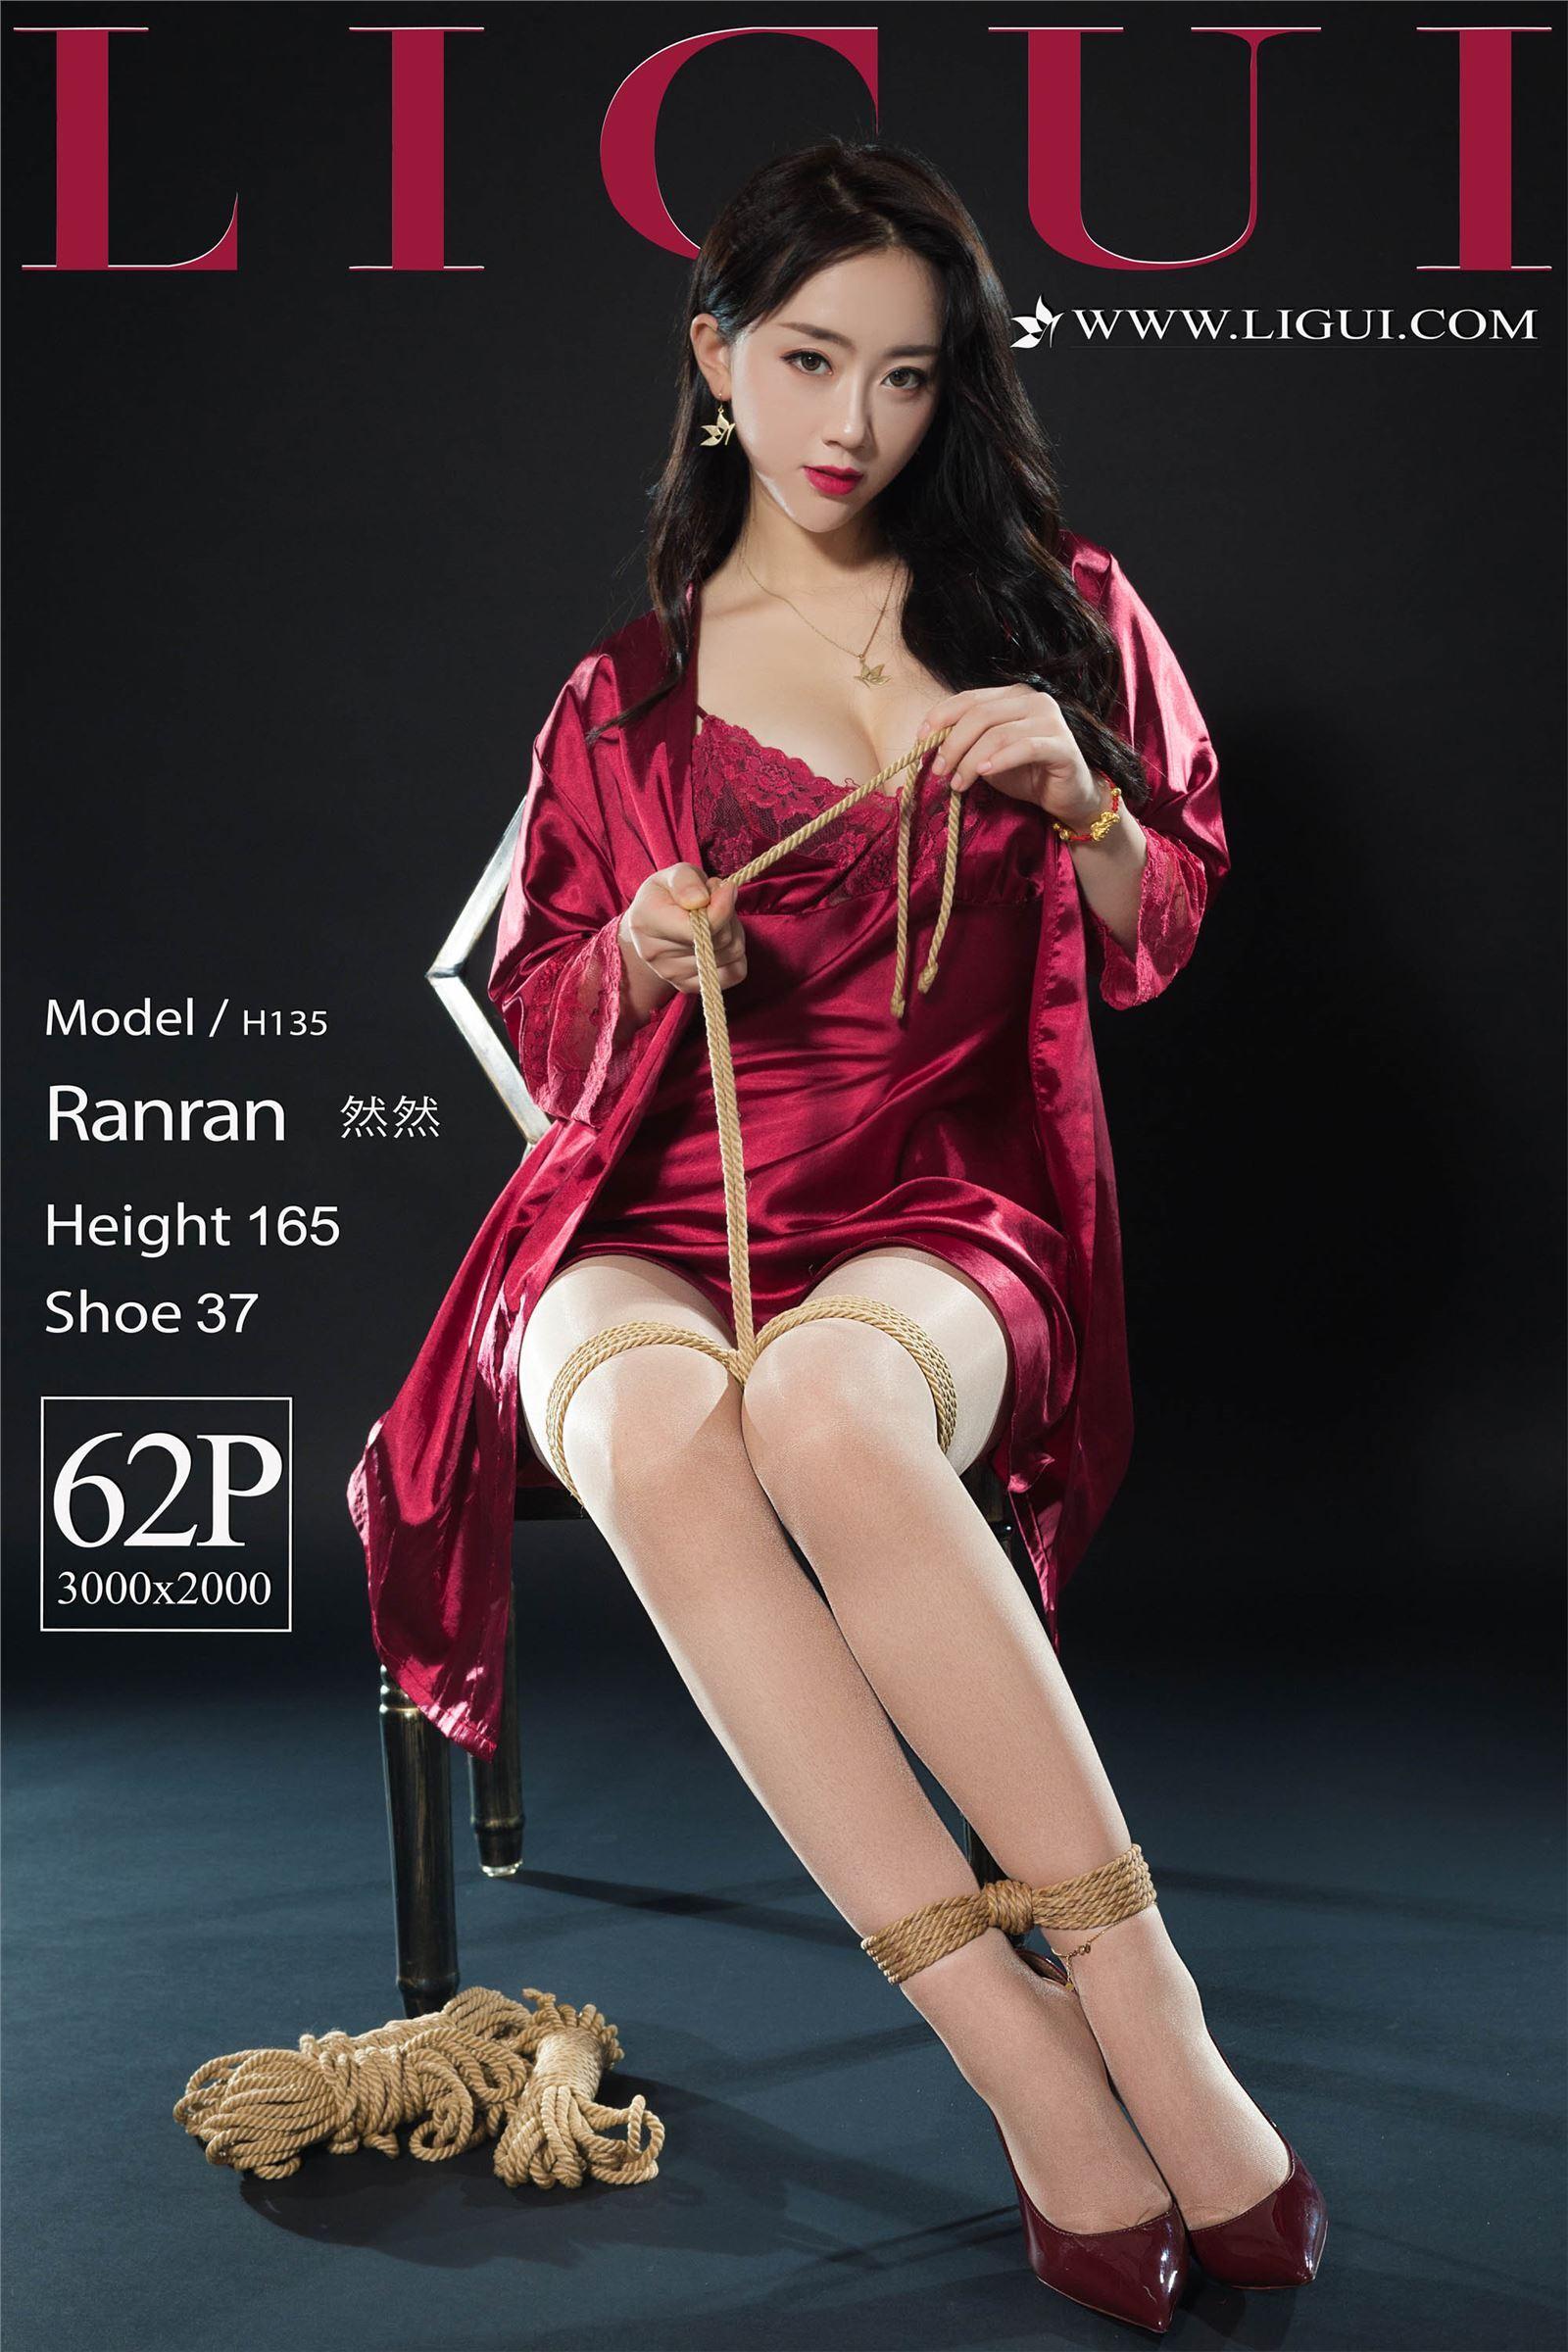 Ligui丽柜 网络丽人 2018.10.19 Model 然然